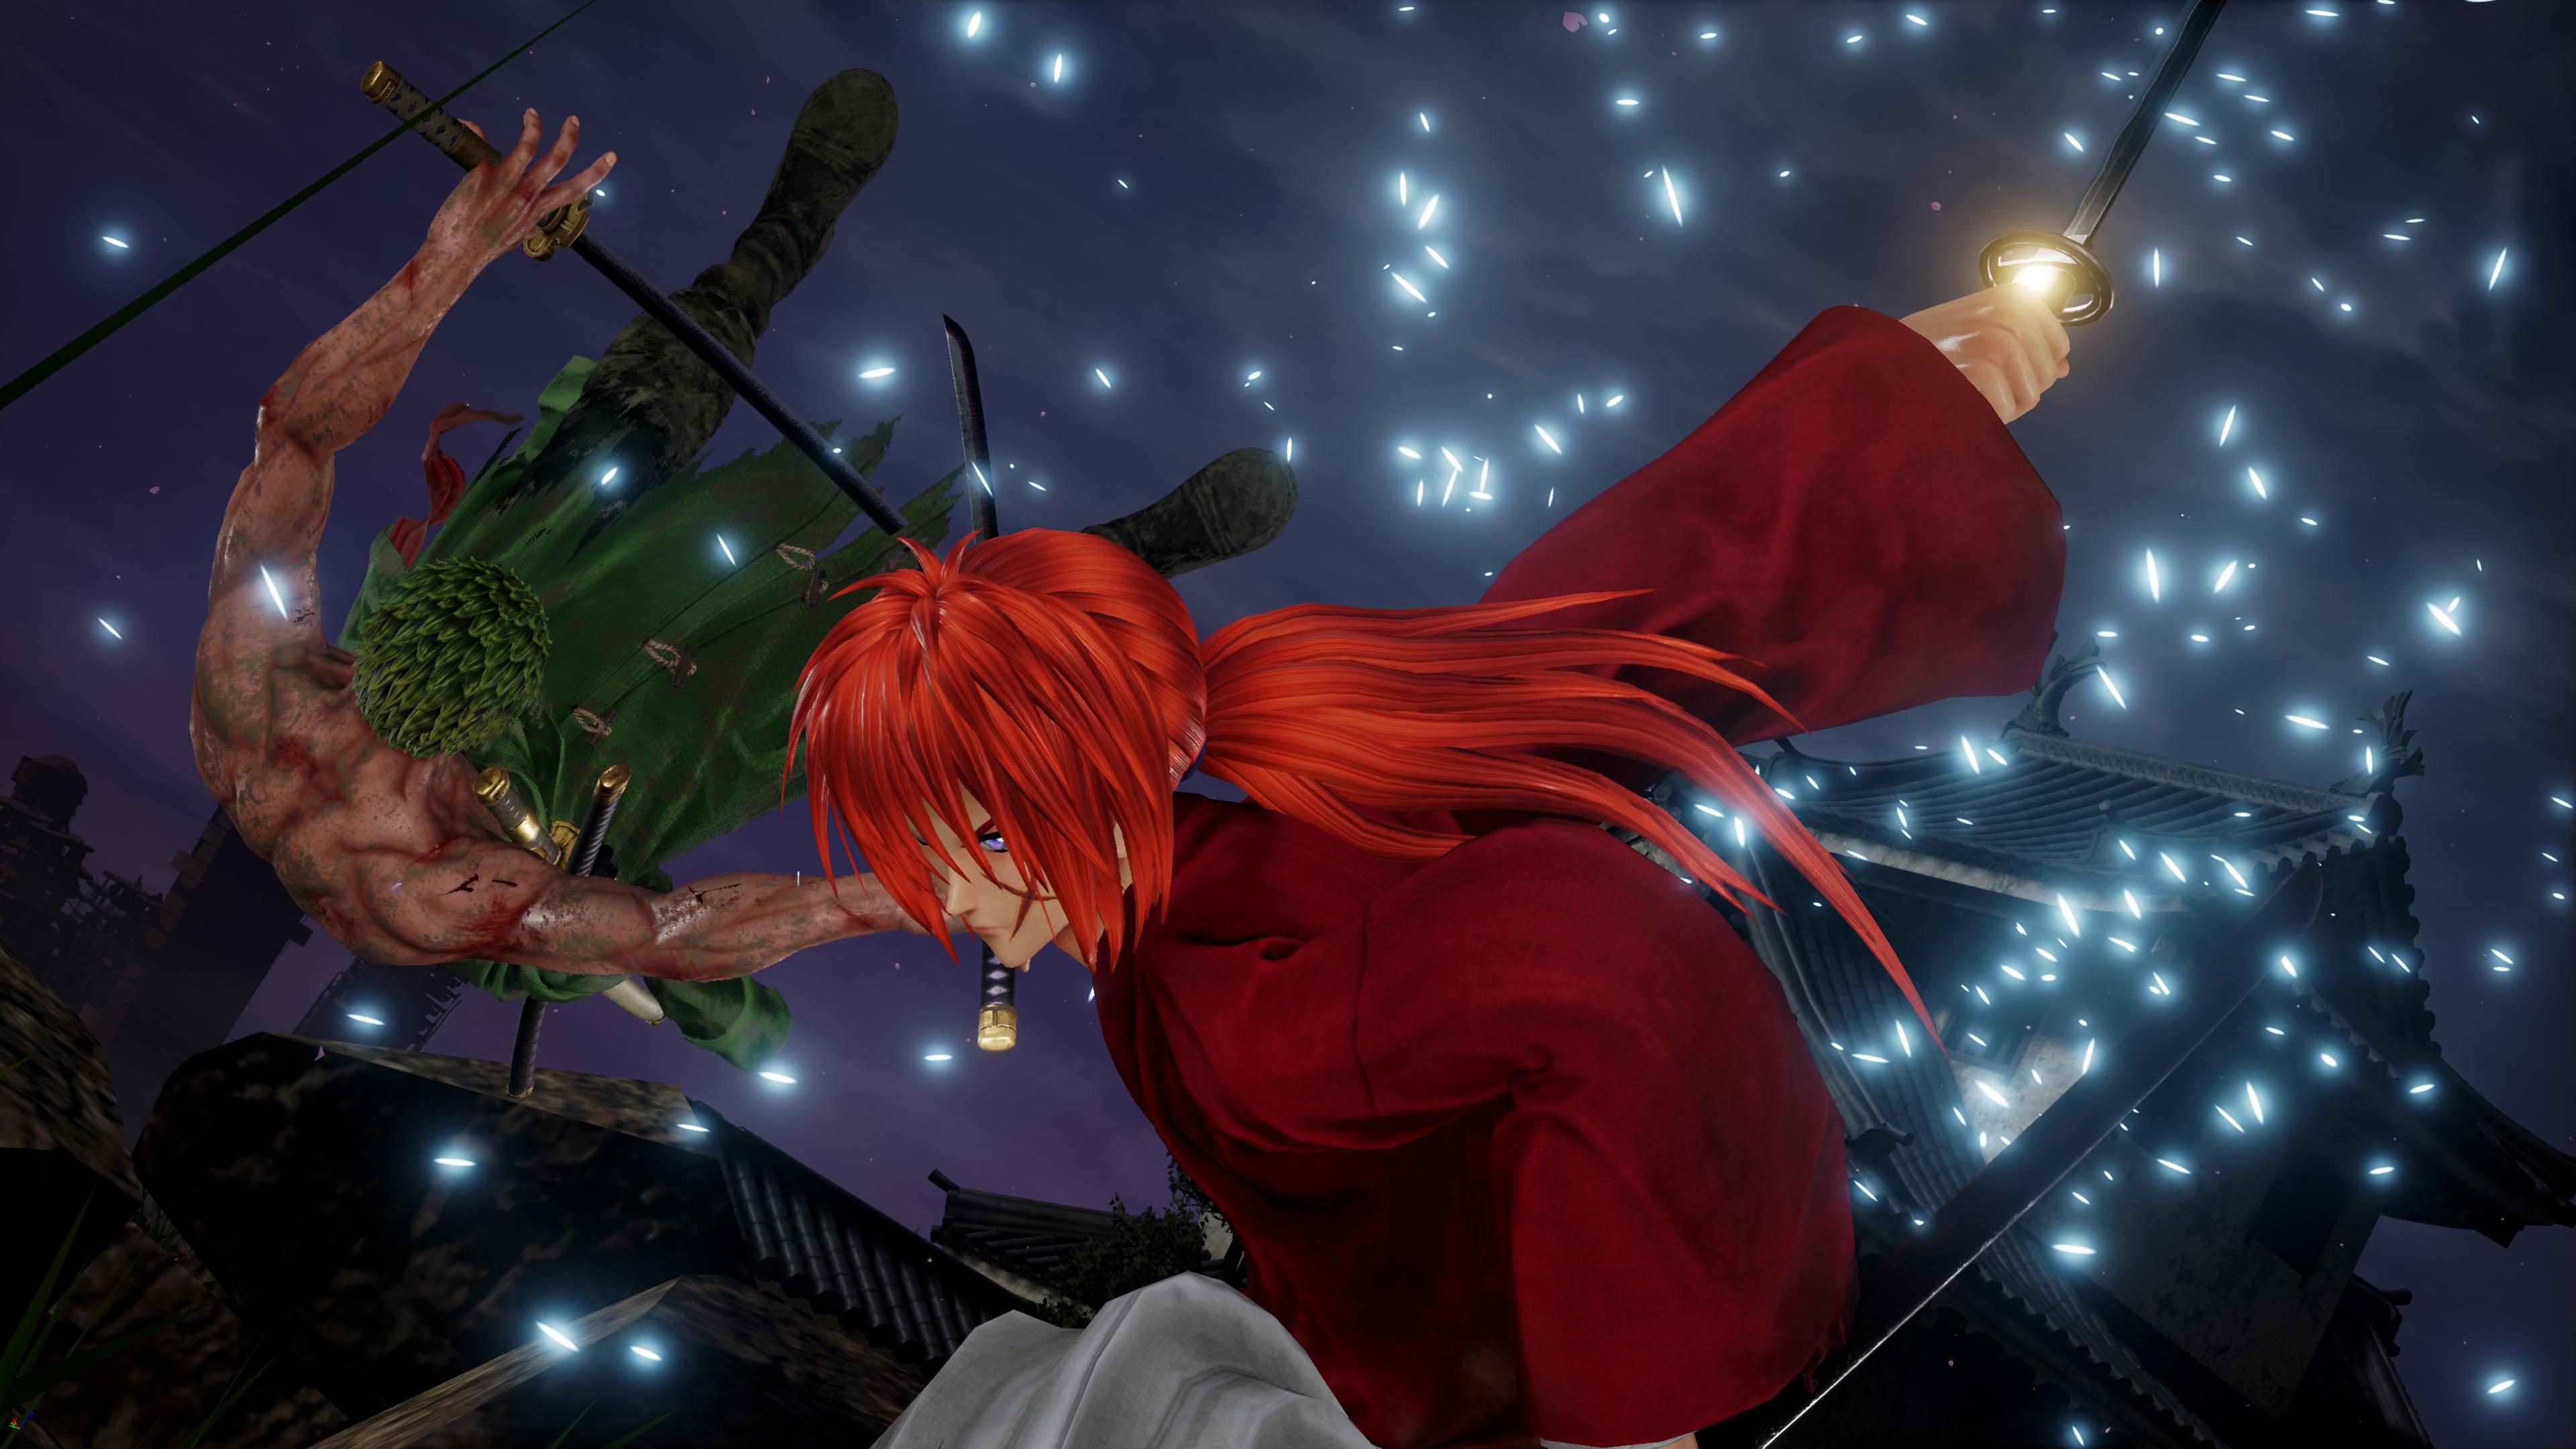 Jump Force - Kenshin vs Zoro